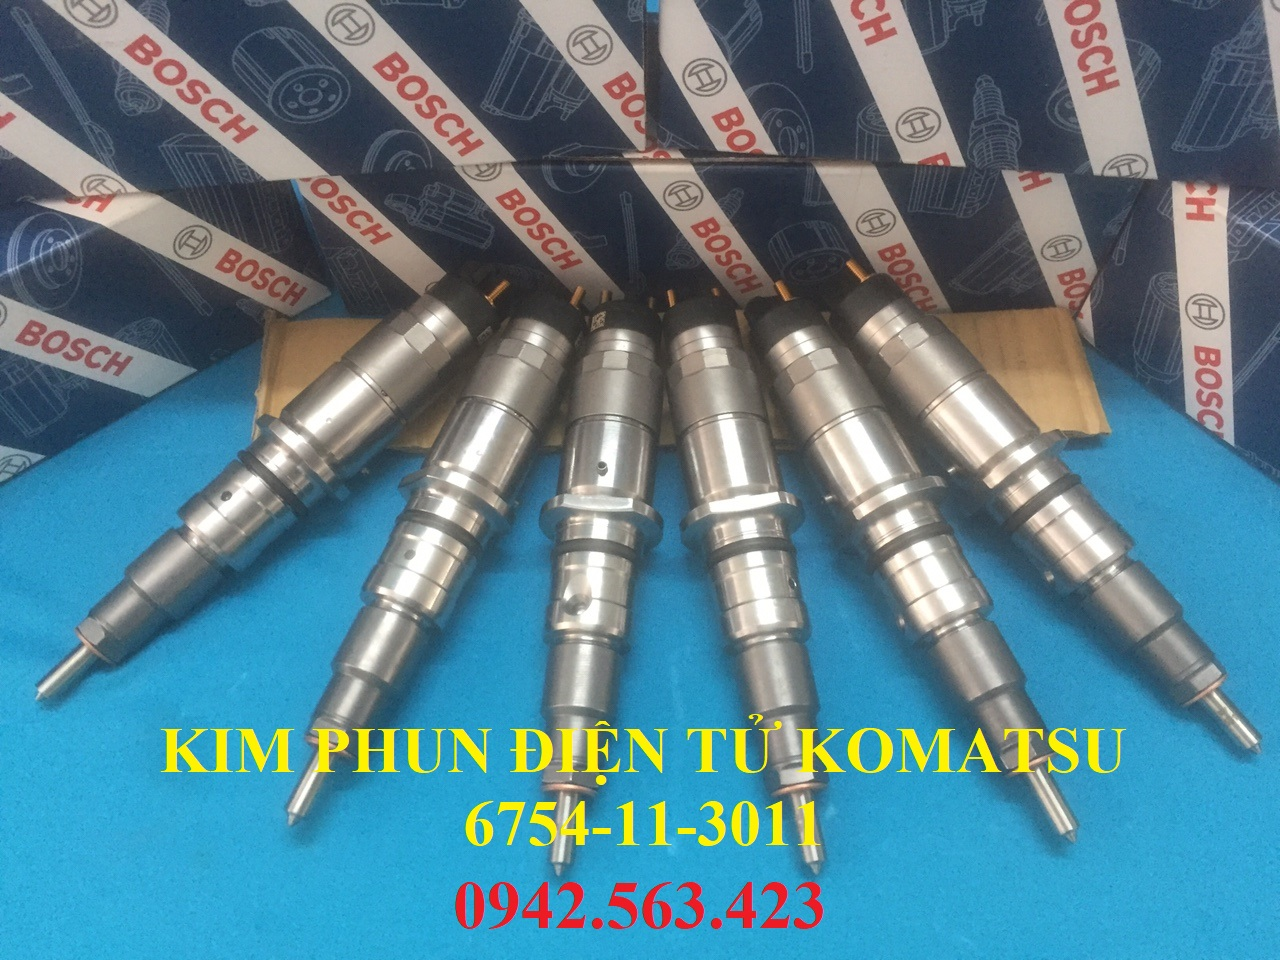 Kim phun điện tử Komatsu 6754-11-3011 lắp PC200-8, PC220-8, PC240-8, WA420-3, WA380-3